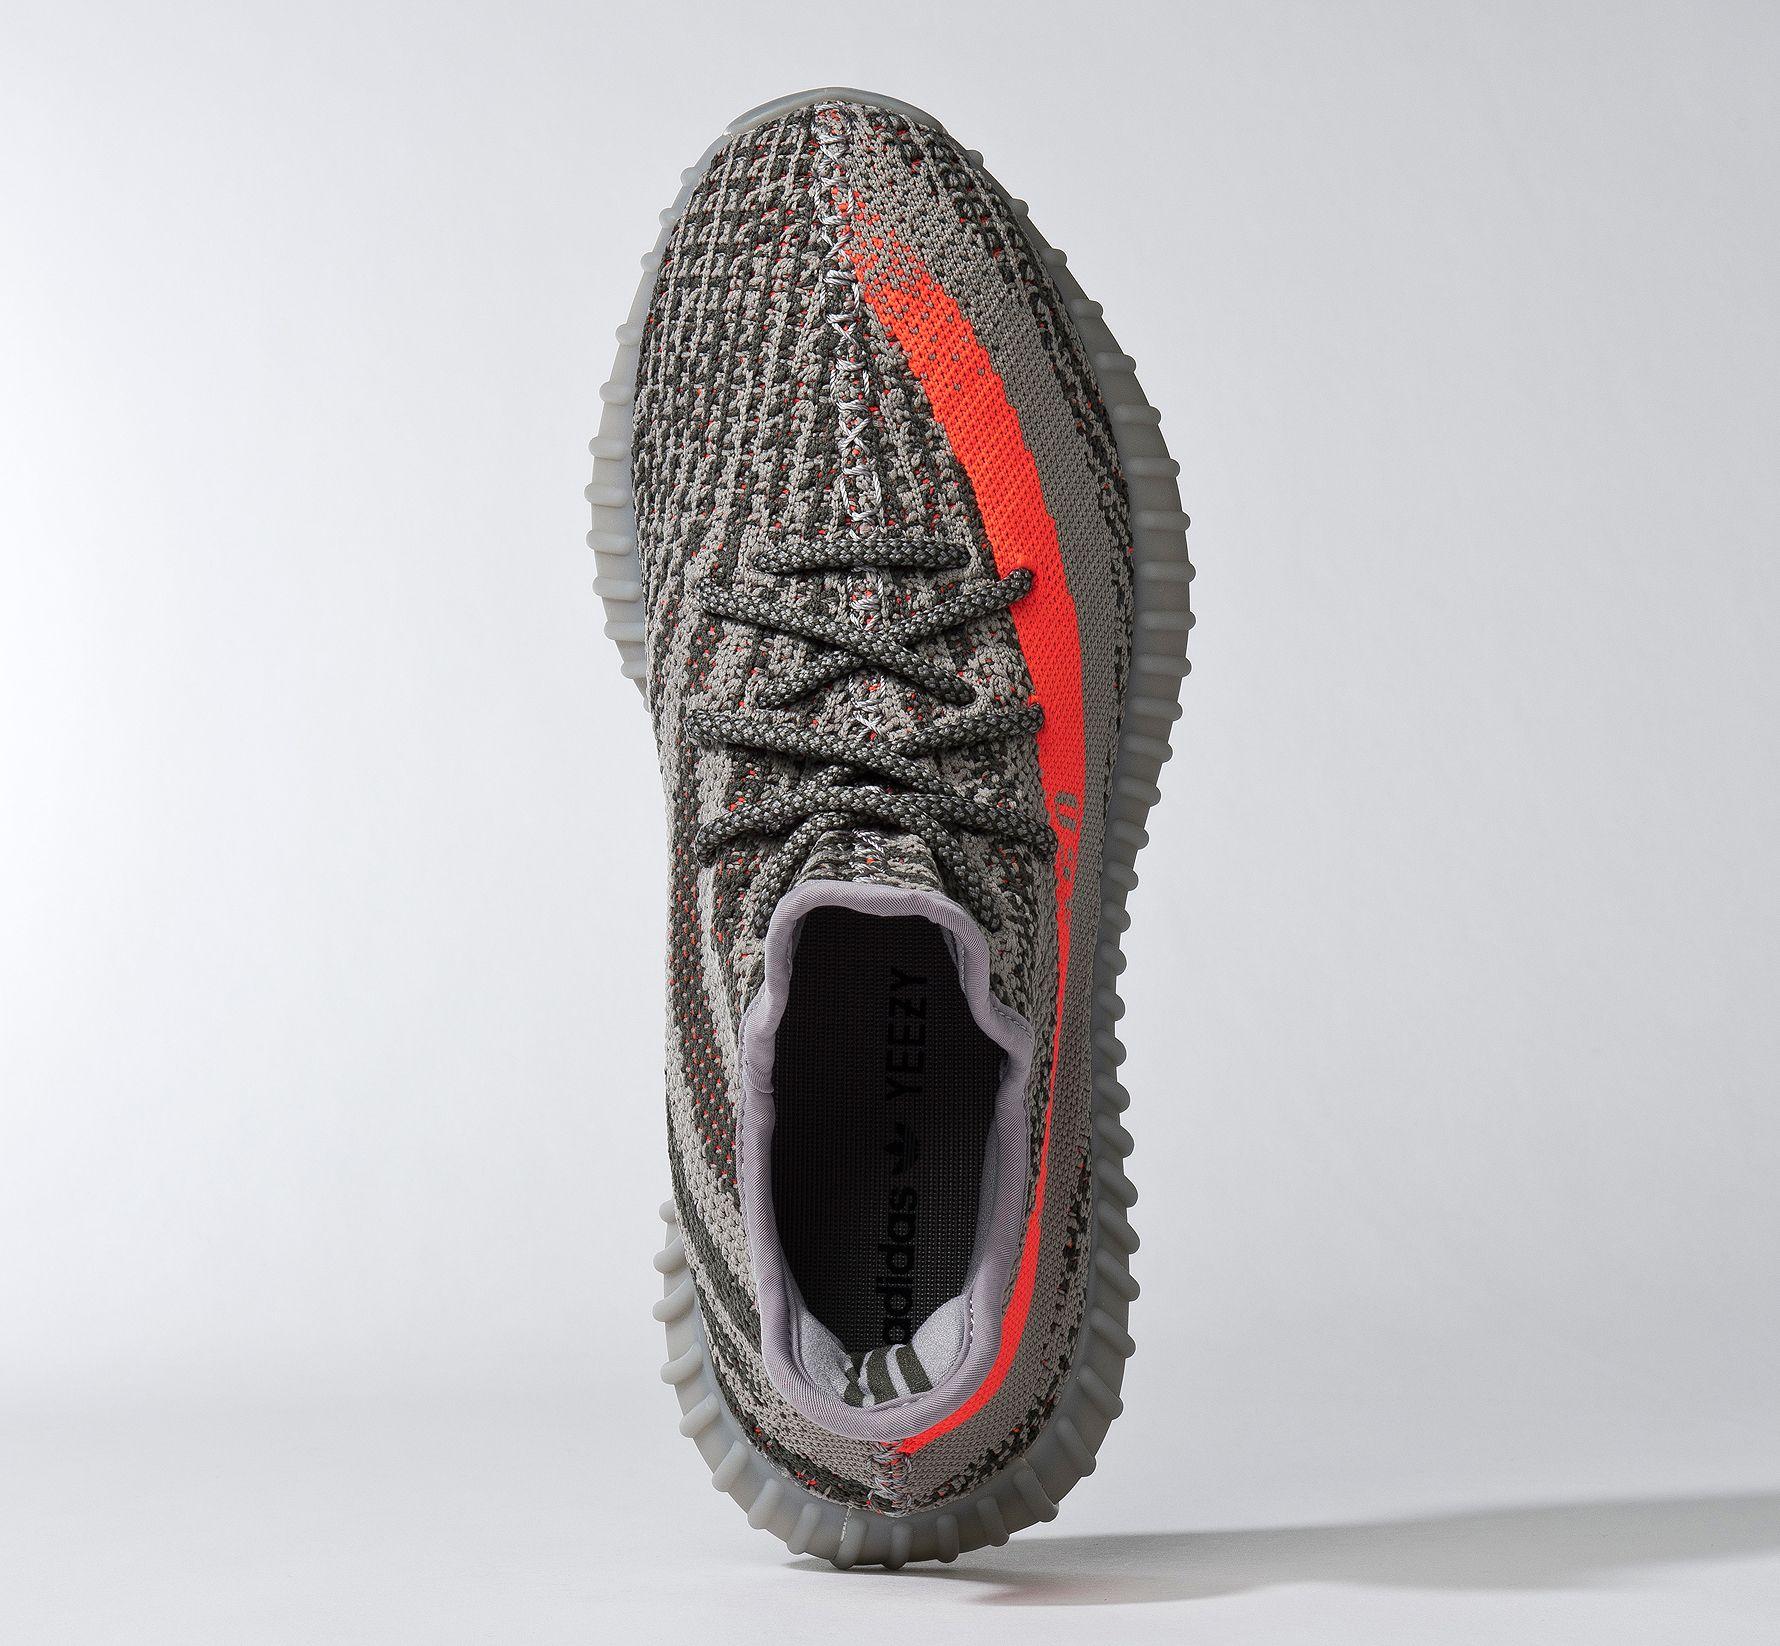 adidas nmd pk winter wool fake vs real yeezy boost 350